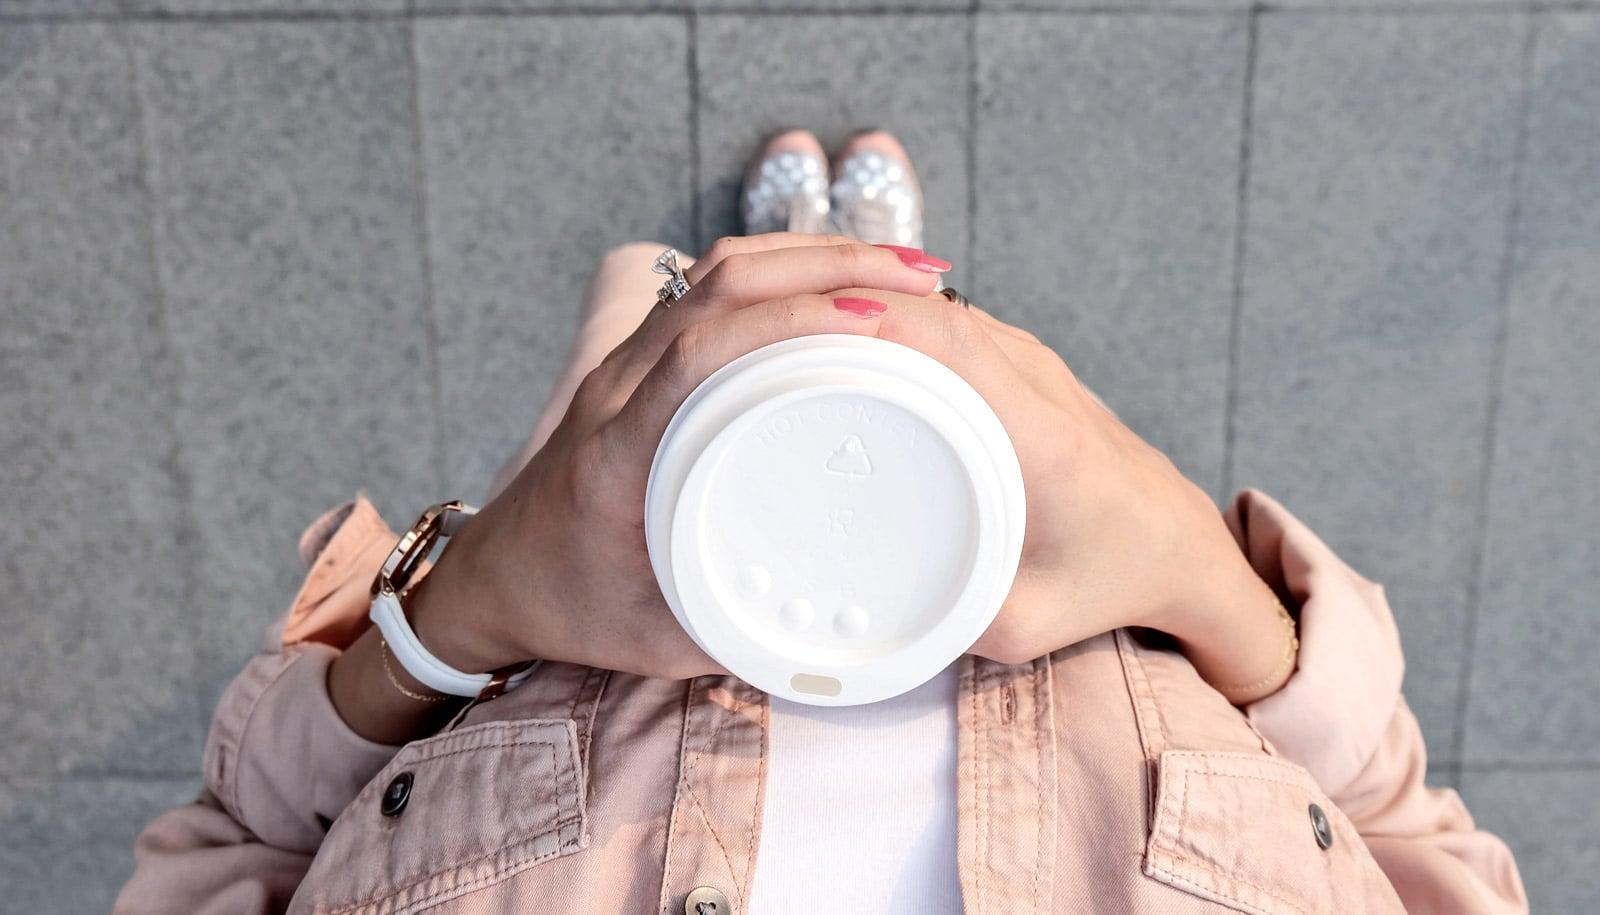 Microfluidic 'placenta' tests if fetus gets caffeine